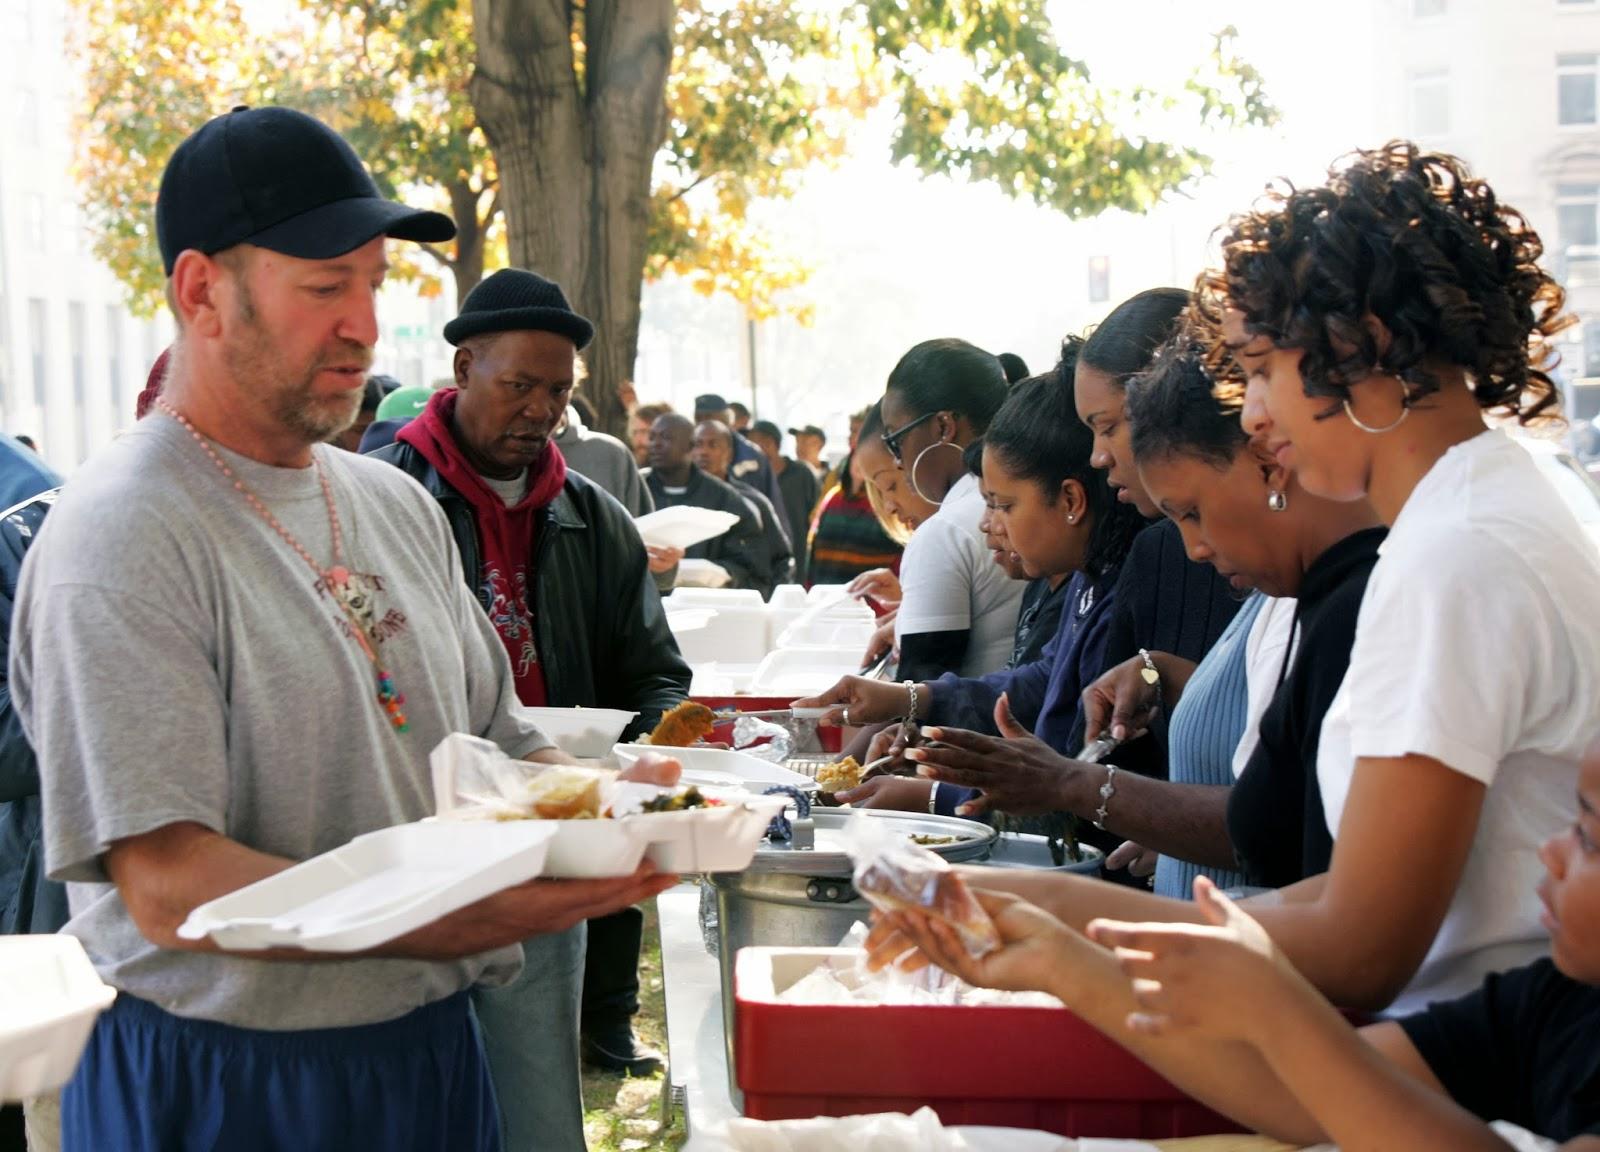 beltway church of christ feeding the homeless – hope chapel honolulu